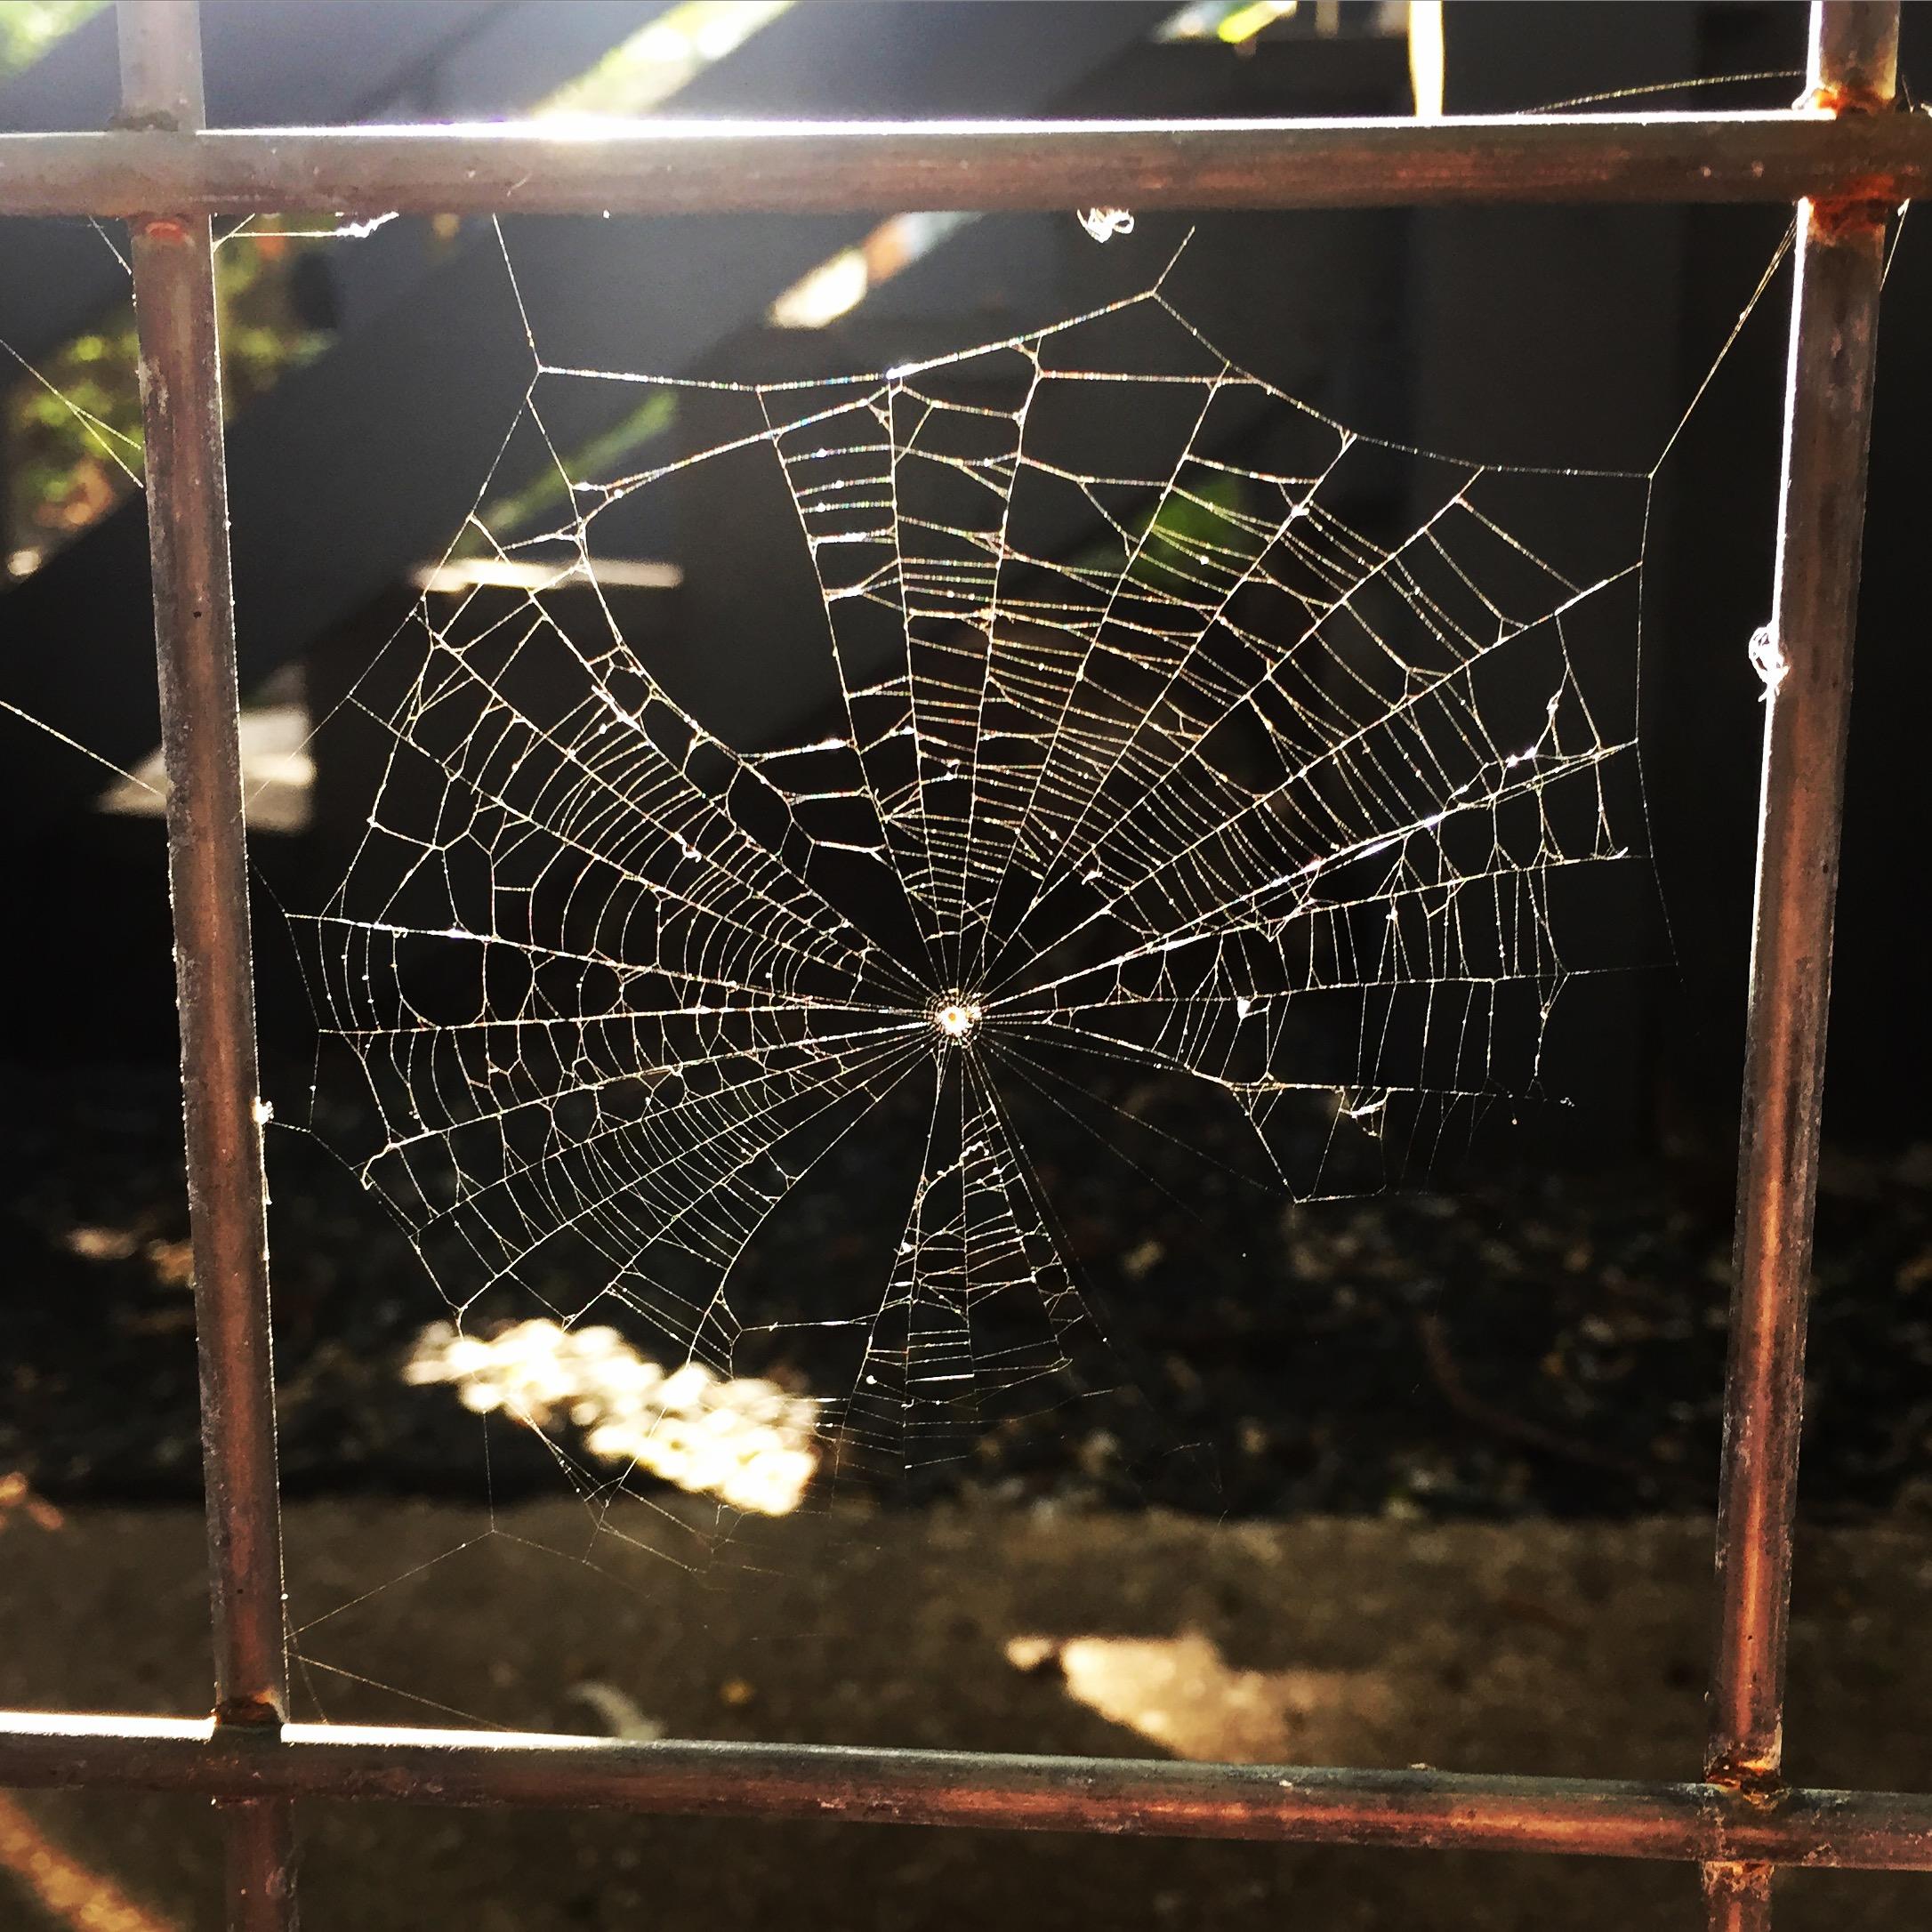 spiderweb_sunlight_simple_beauty